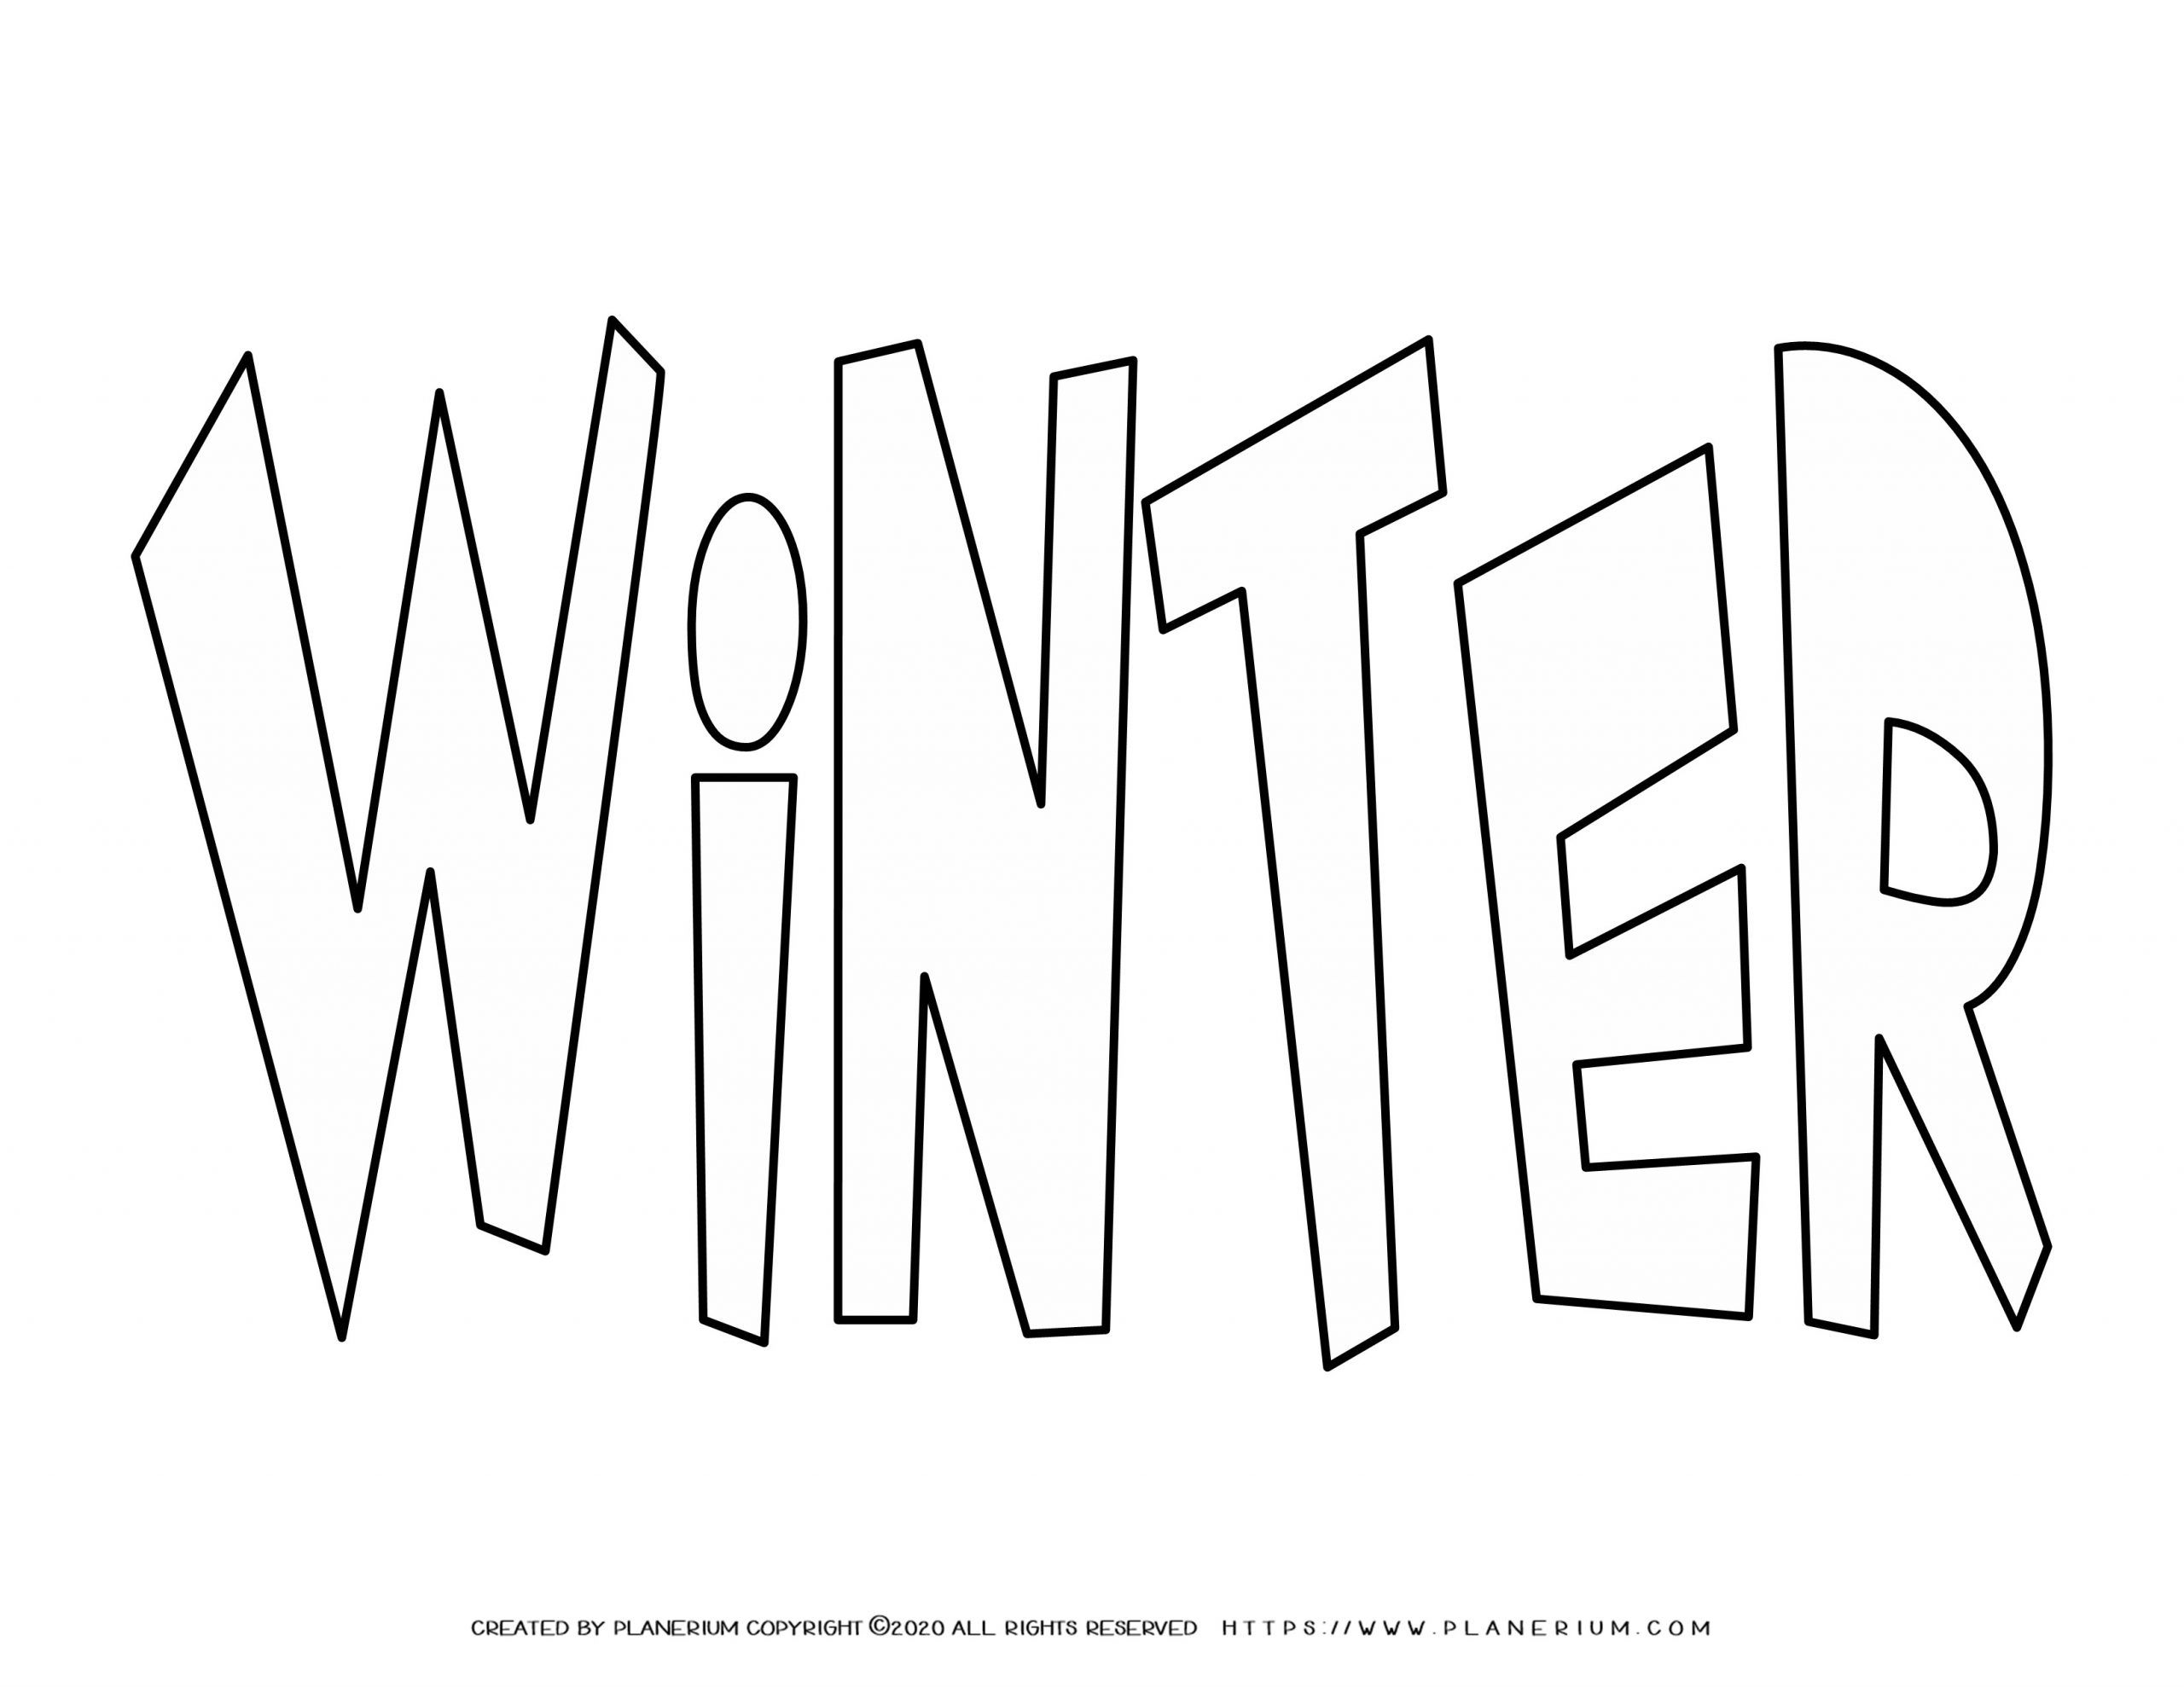 Winter Coloring Page - Large Title | Planerium